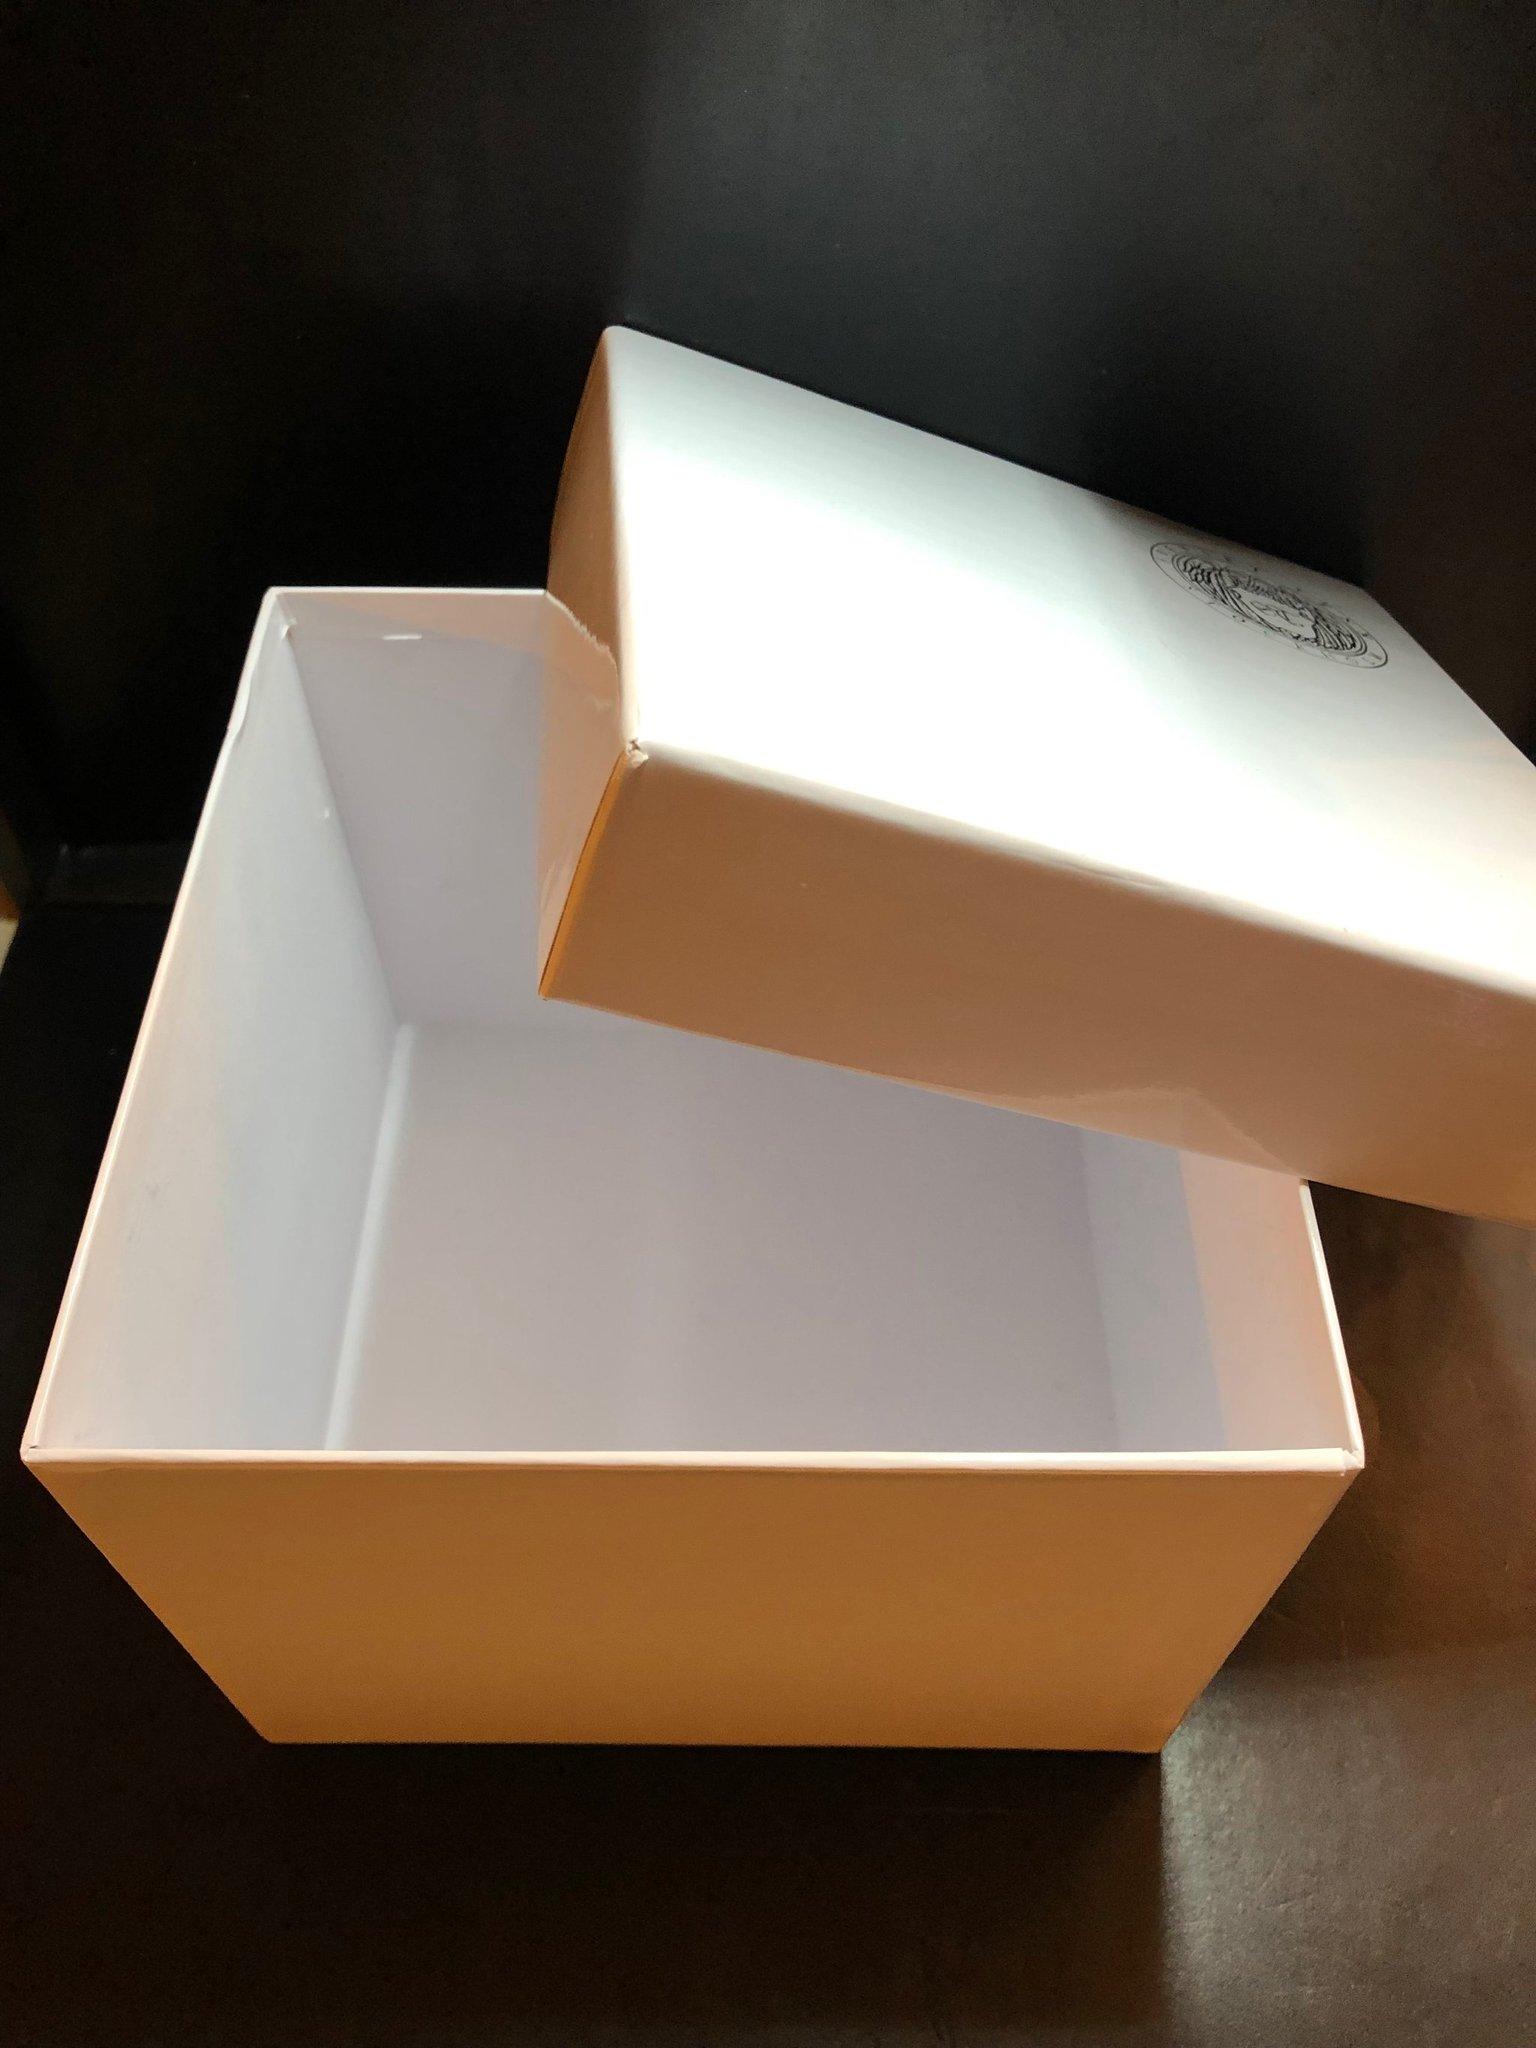 Välkända Firma Svenskt Tenn Present, låda, kartong, ask,.. (363366977) ᐈ PN-63